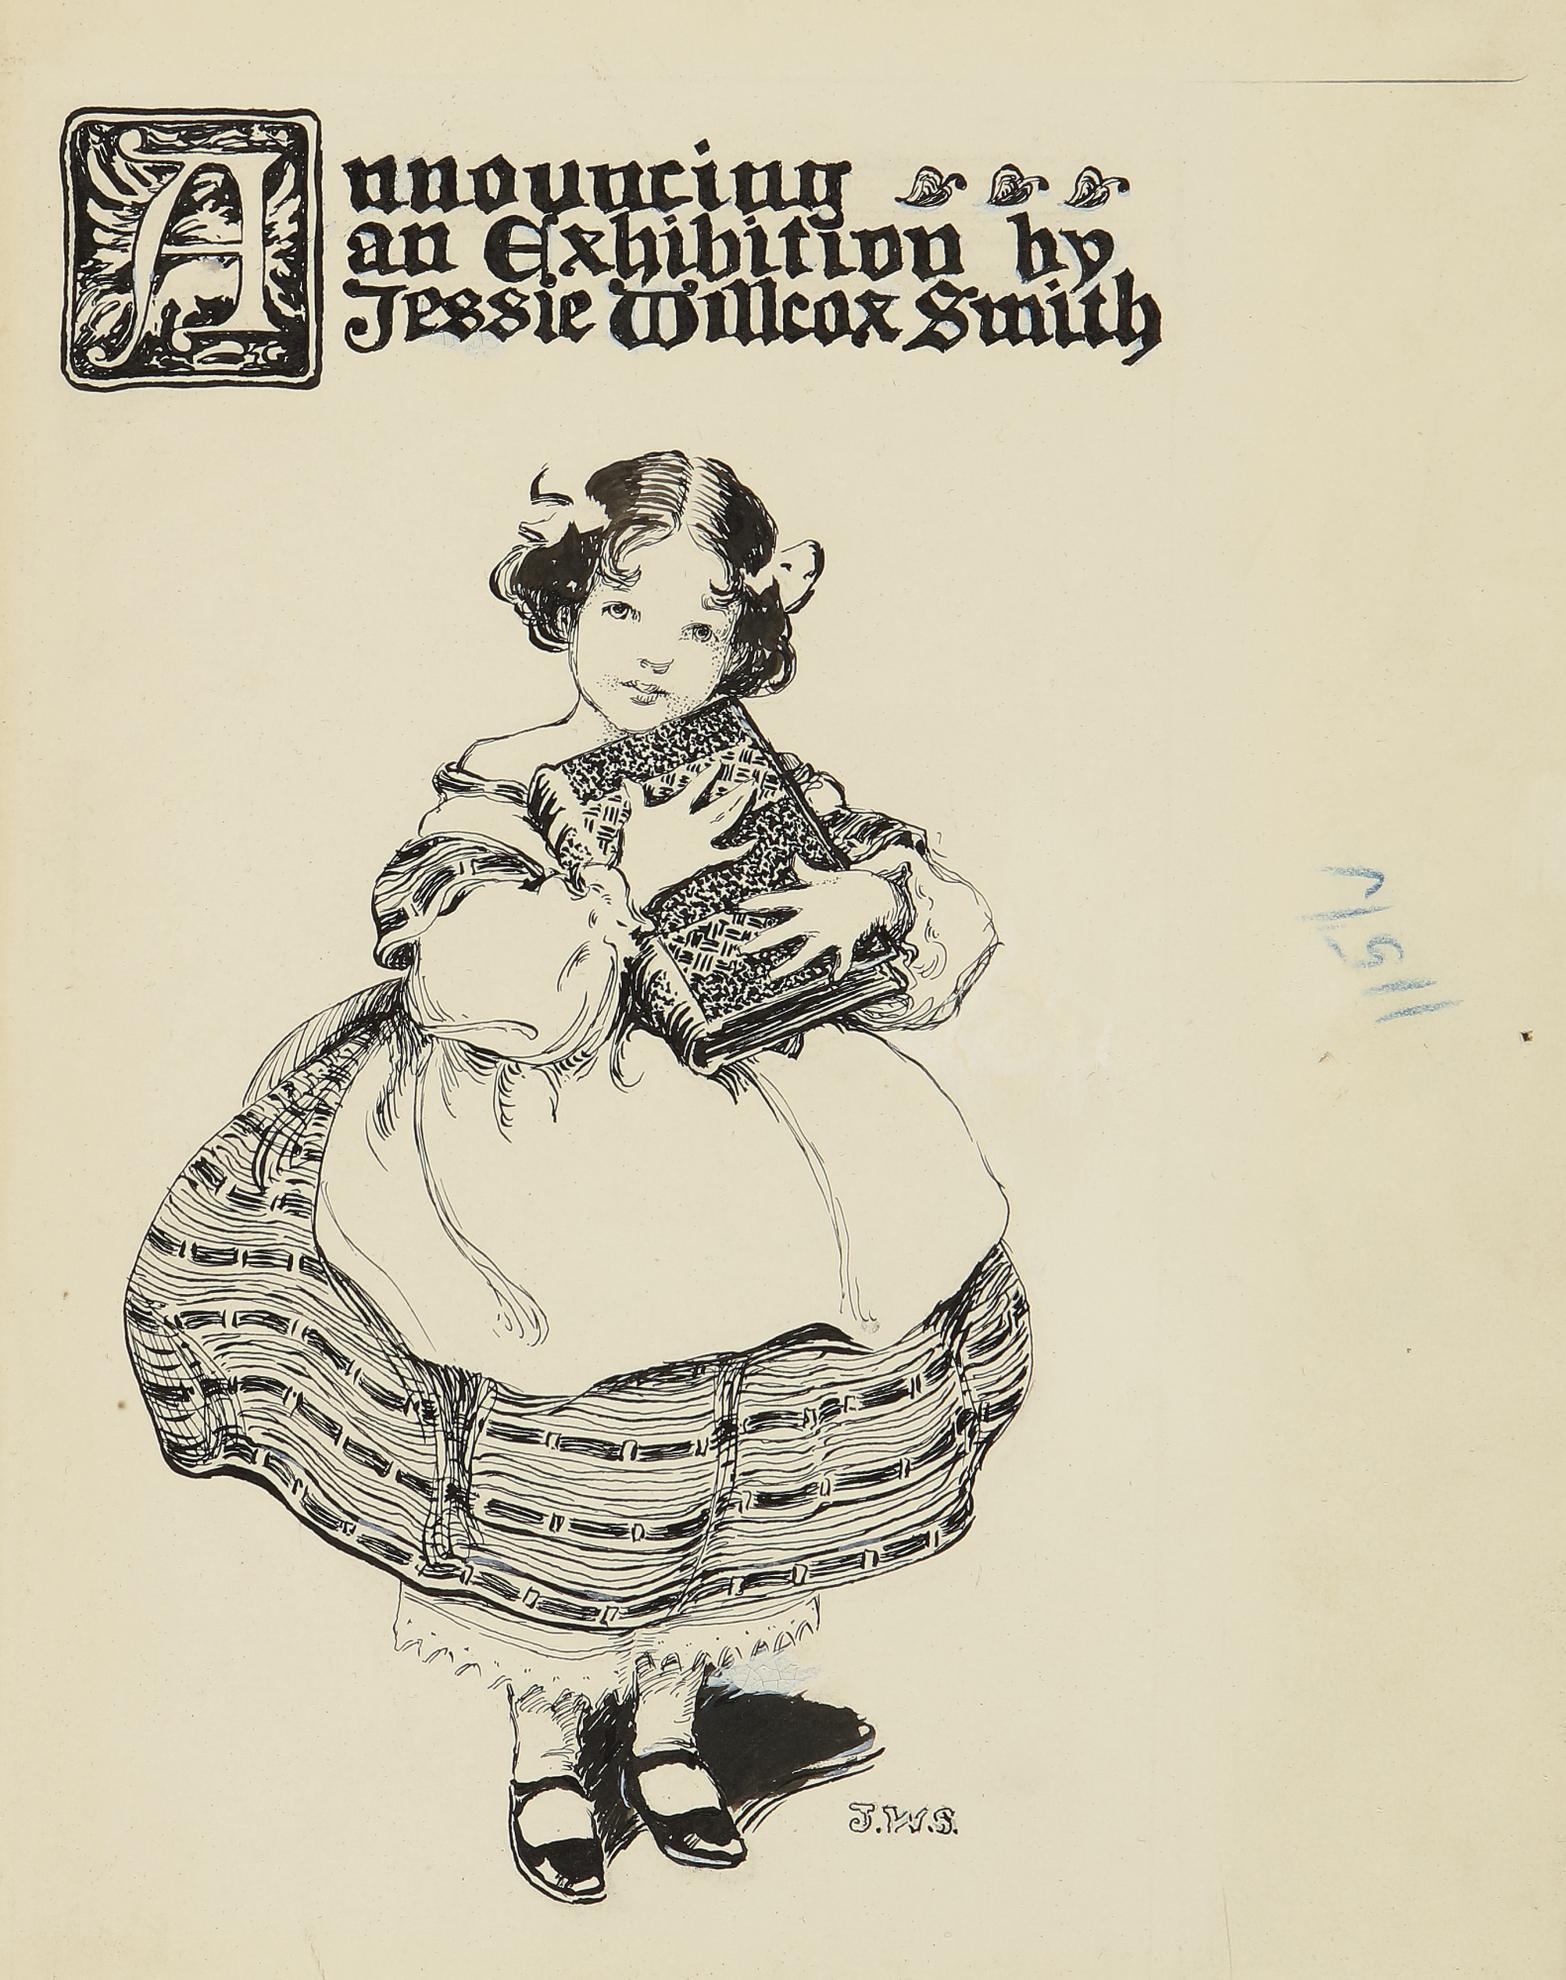 Jessie Willcox Smith-Exhibition Announcement-